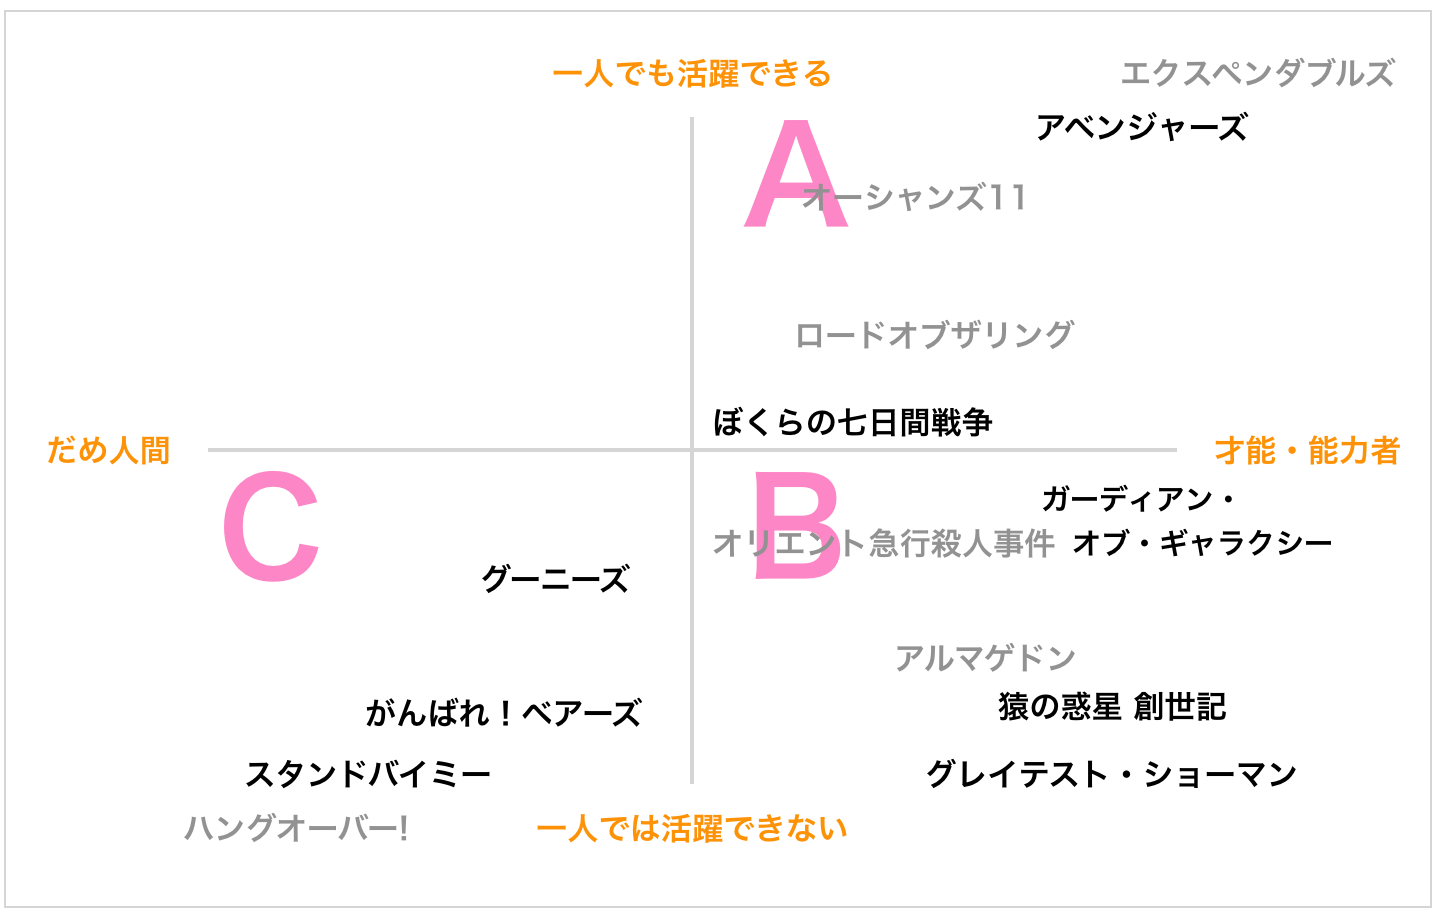 f:id:toyoshi:20180926211156p:plain